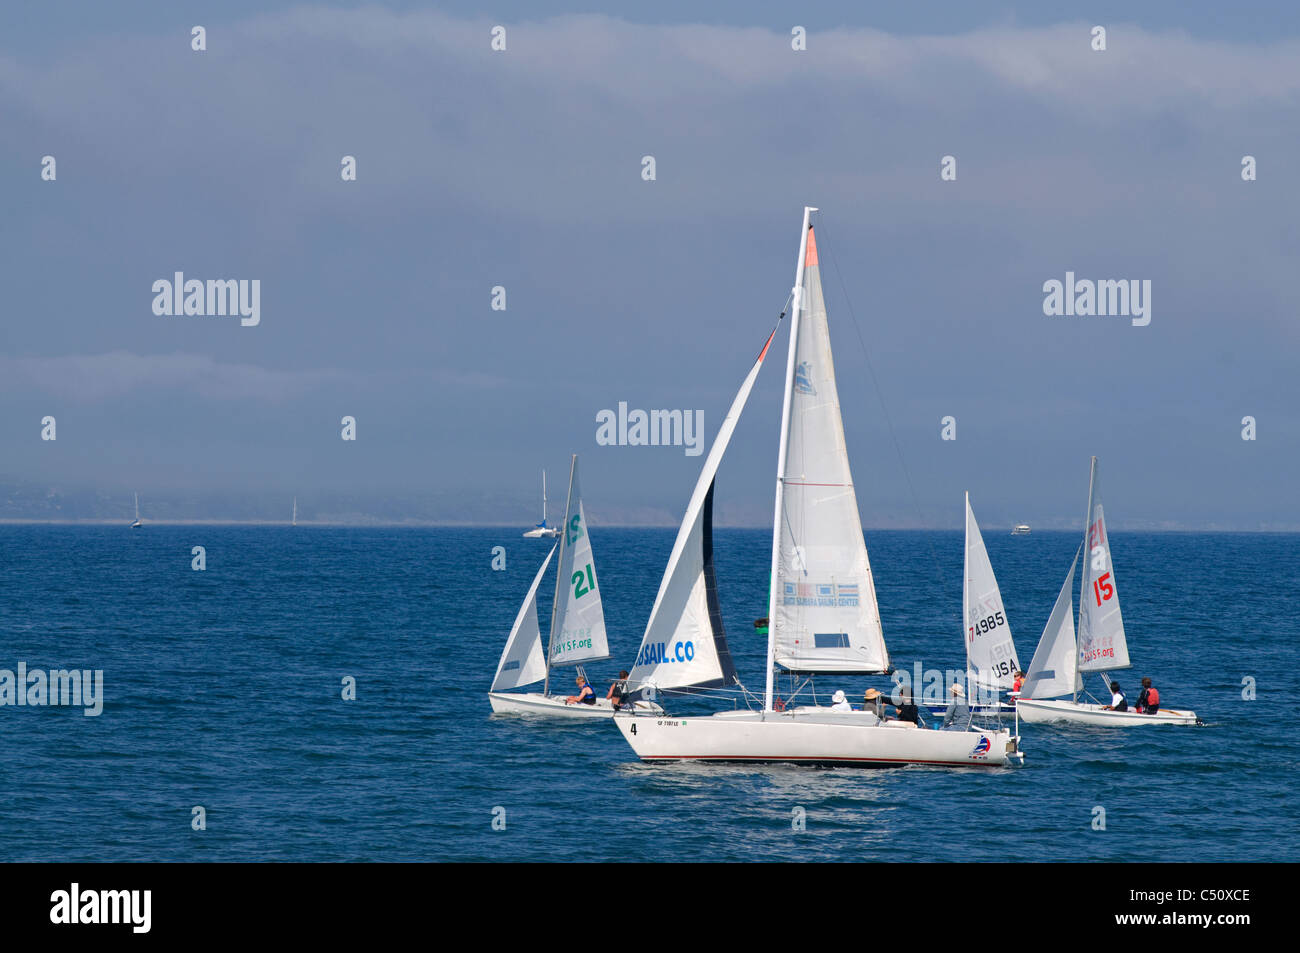 Sailboat regatta in Santa Barbara, CA - Stock Image